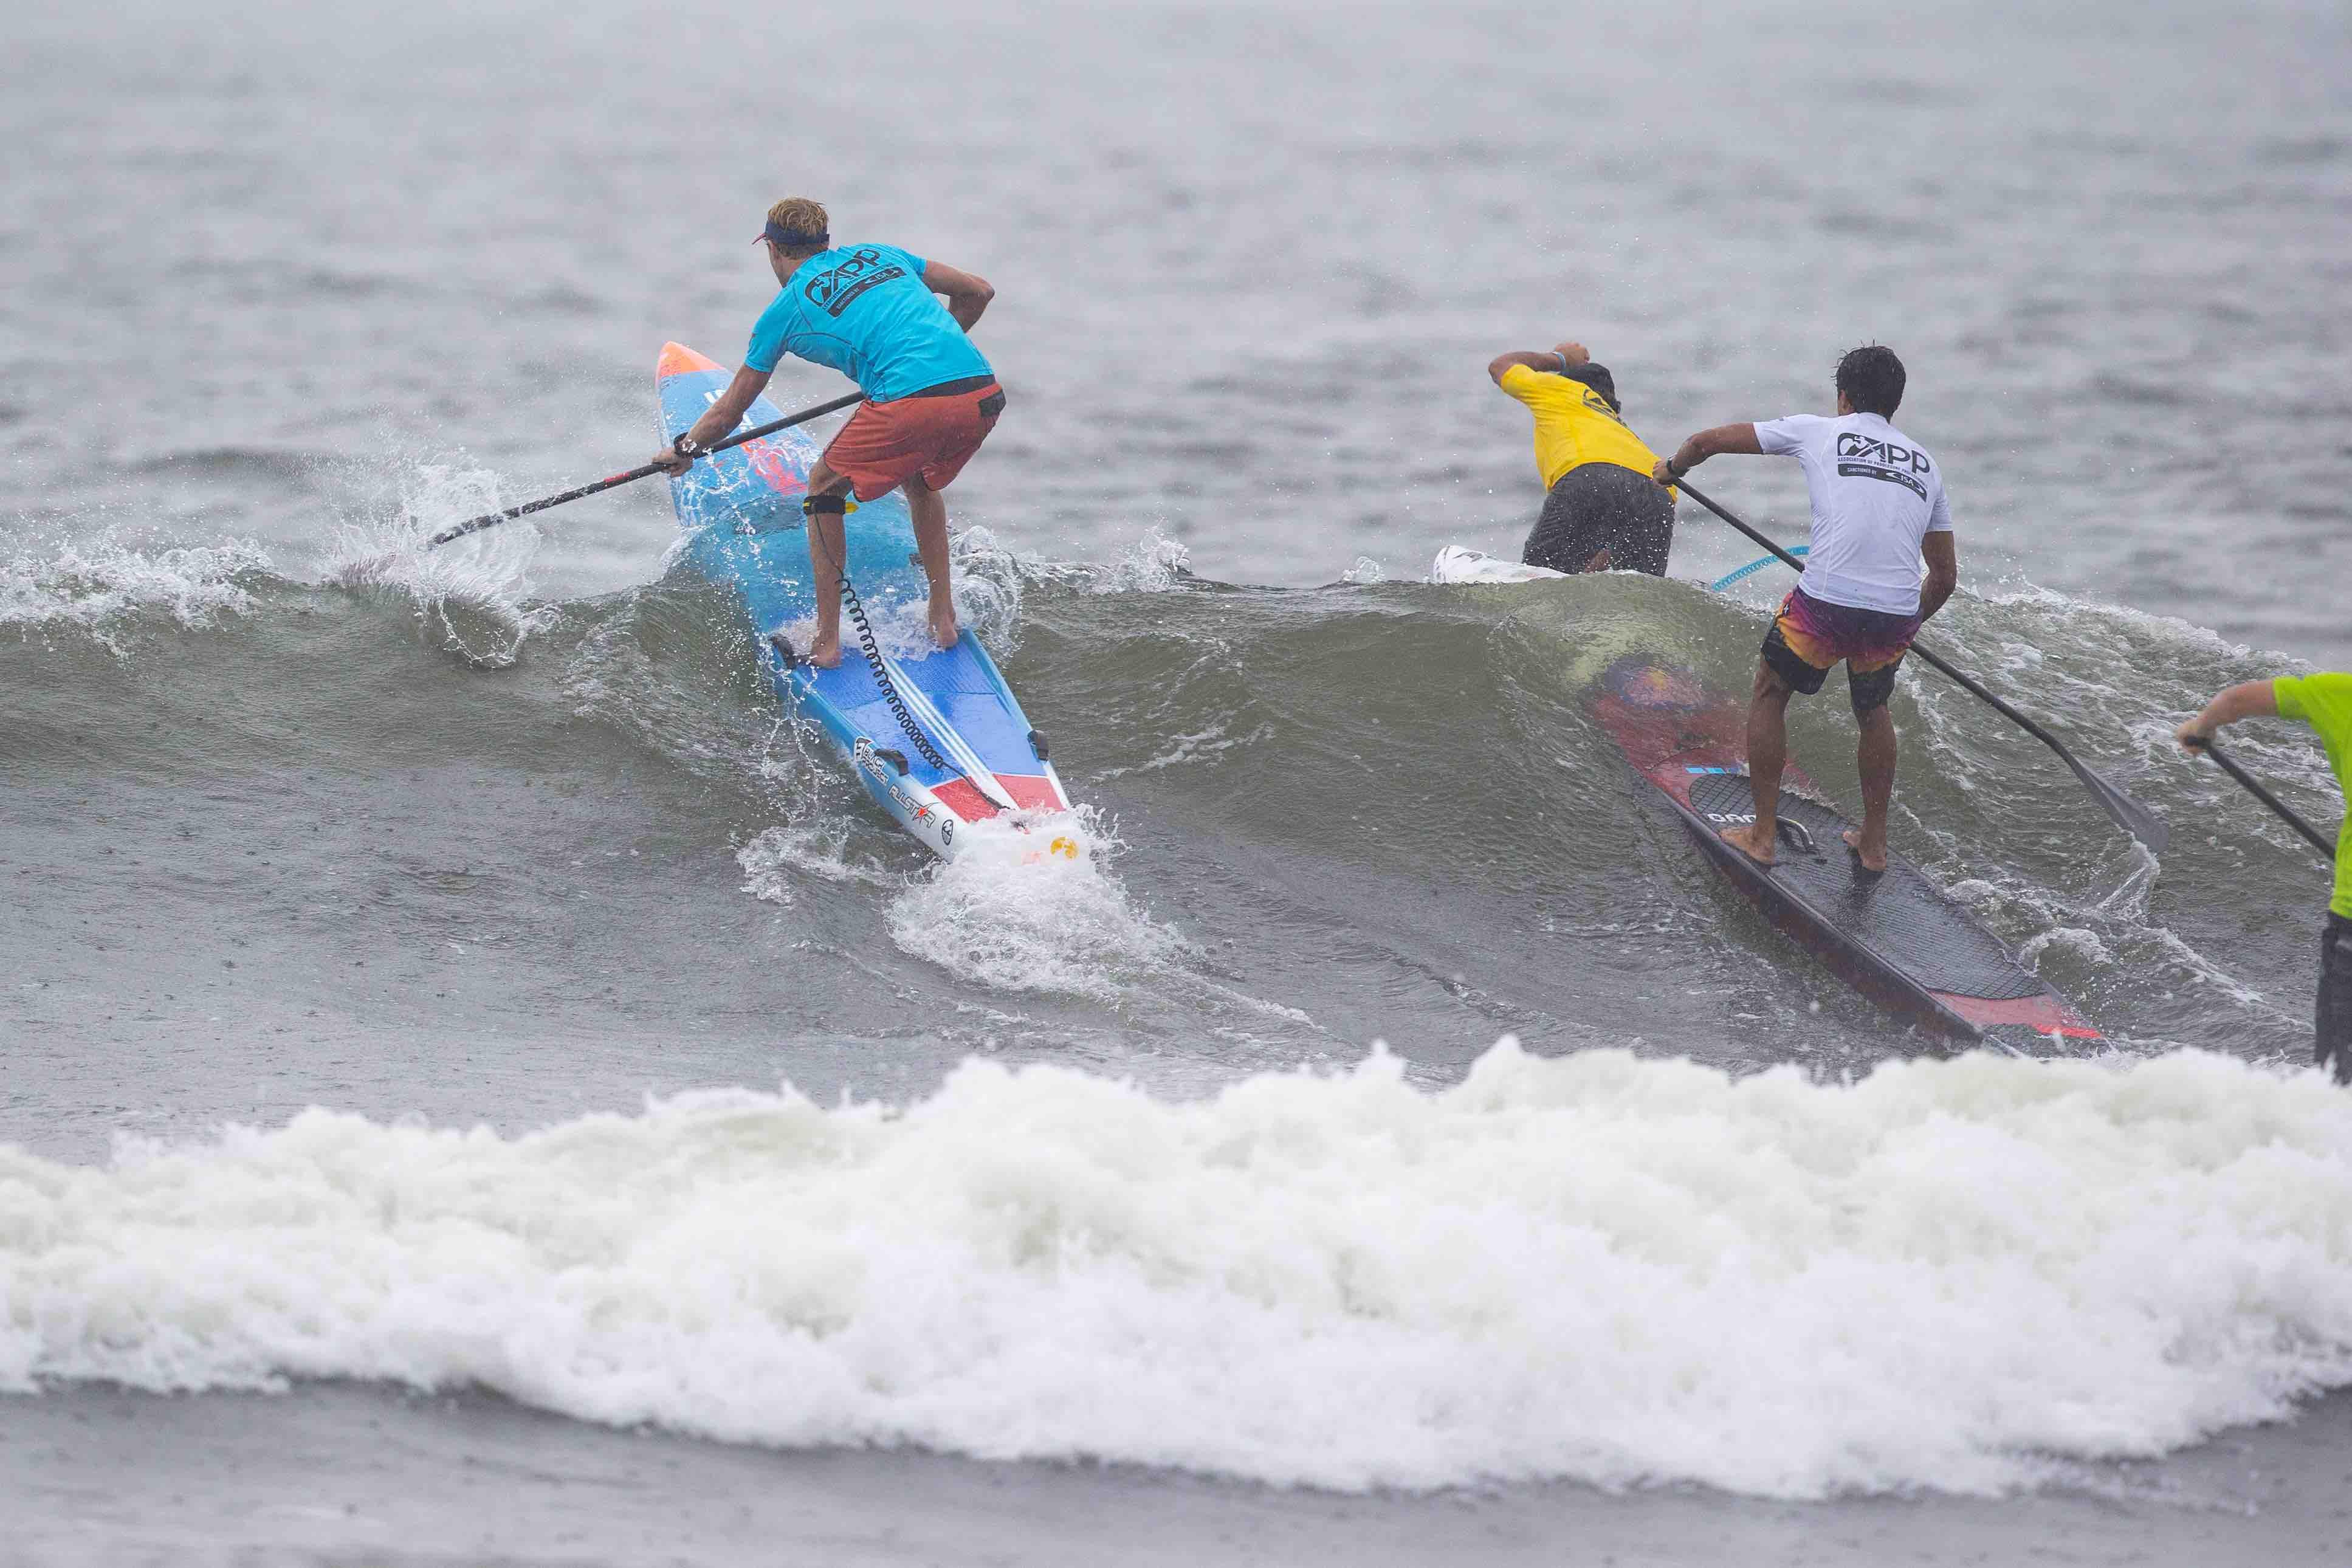 connor-baxter-back-app-2018-ny-sup-open-sprint-beach-race-wave-1